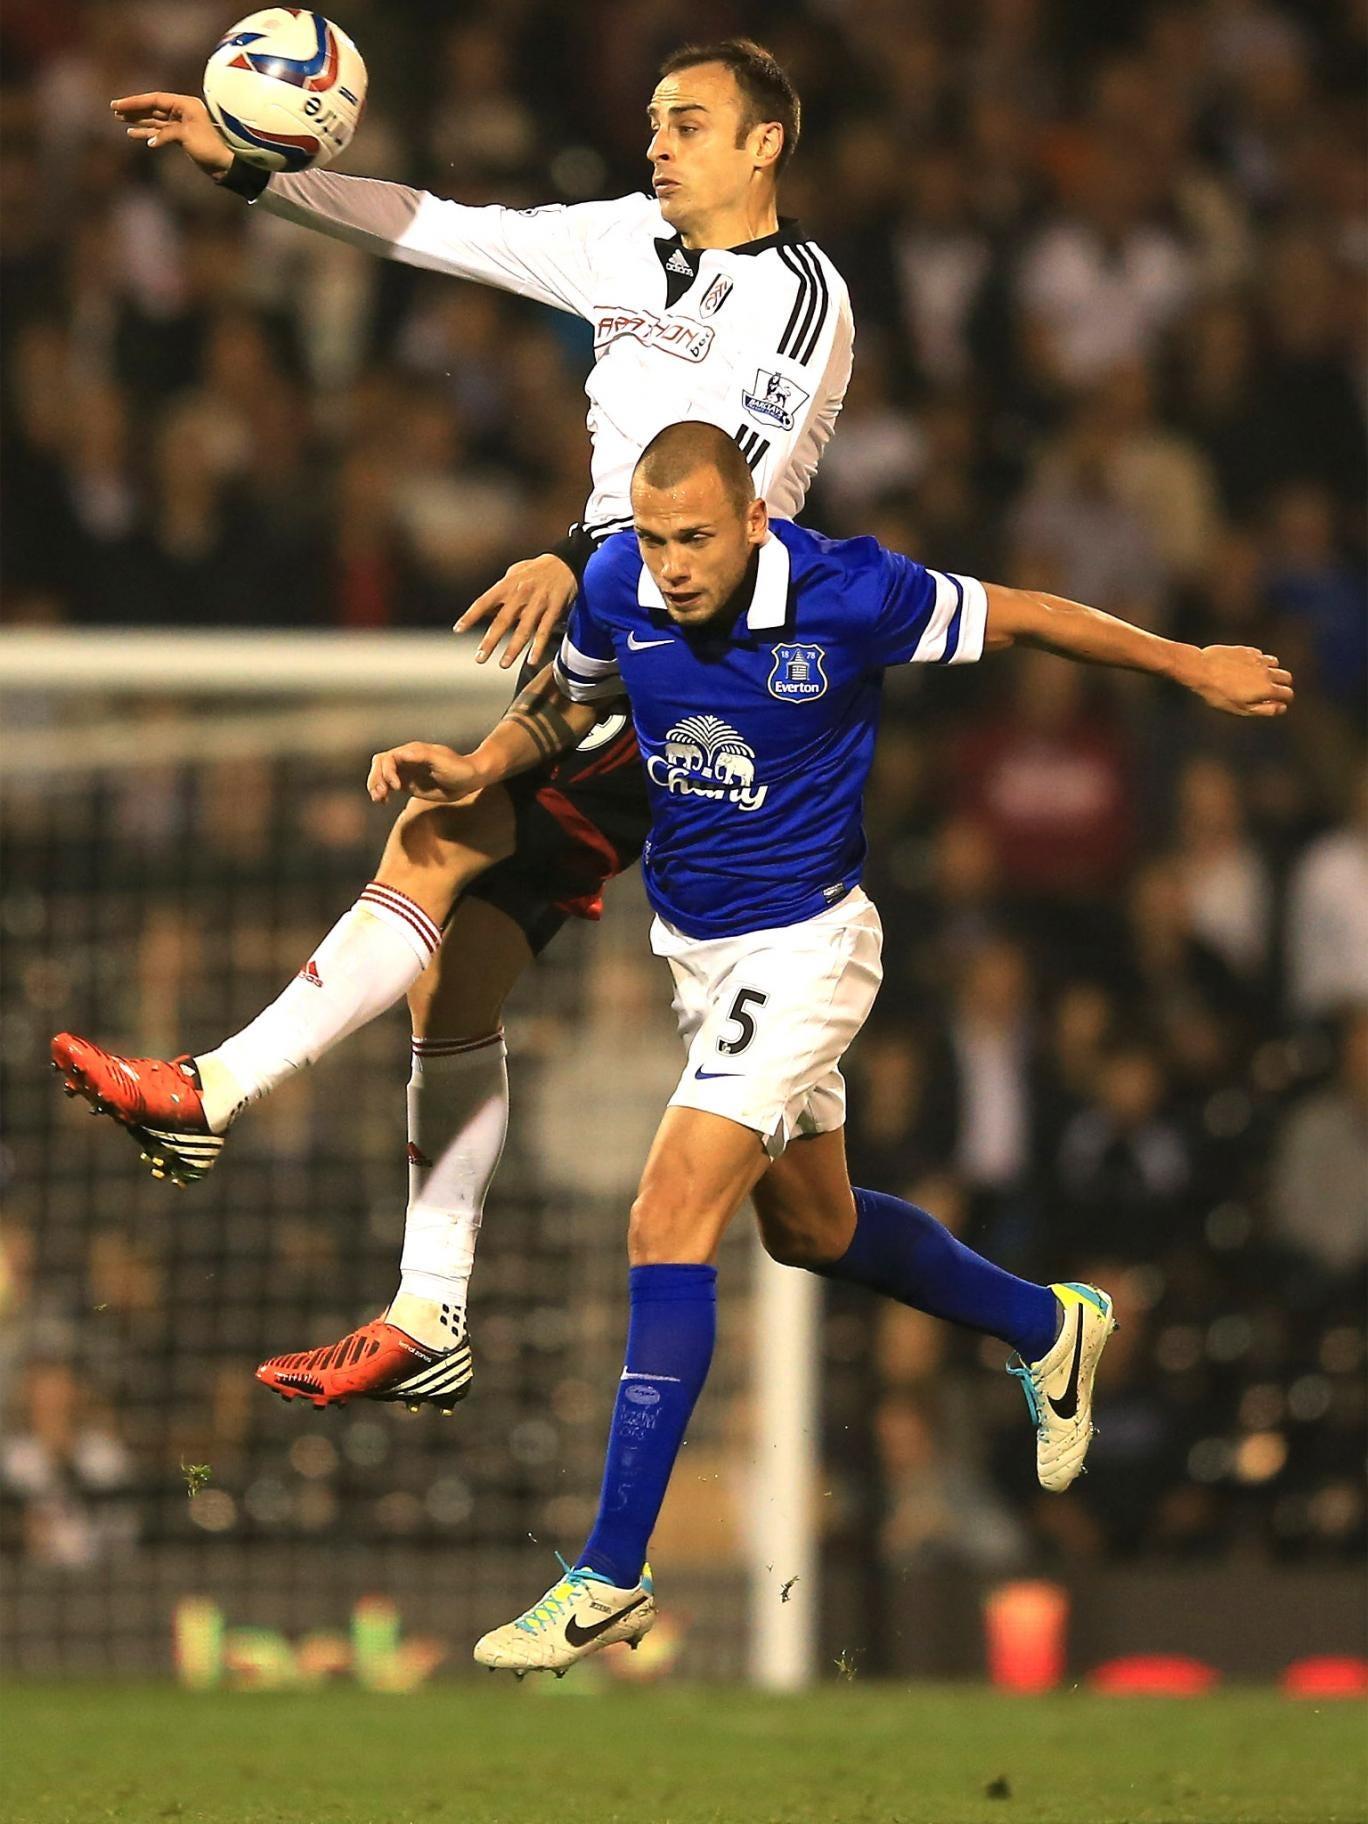 Dimitar Berbatov of Fulham rises above Everton's John Heitinga